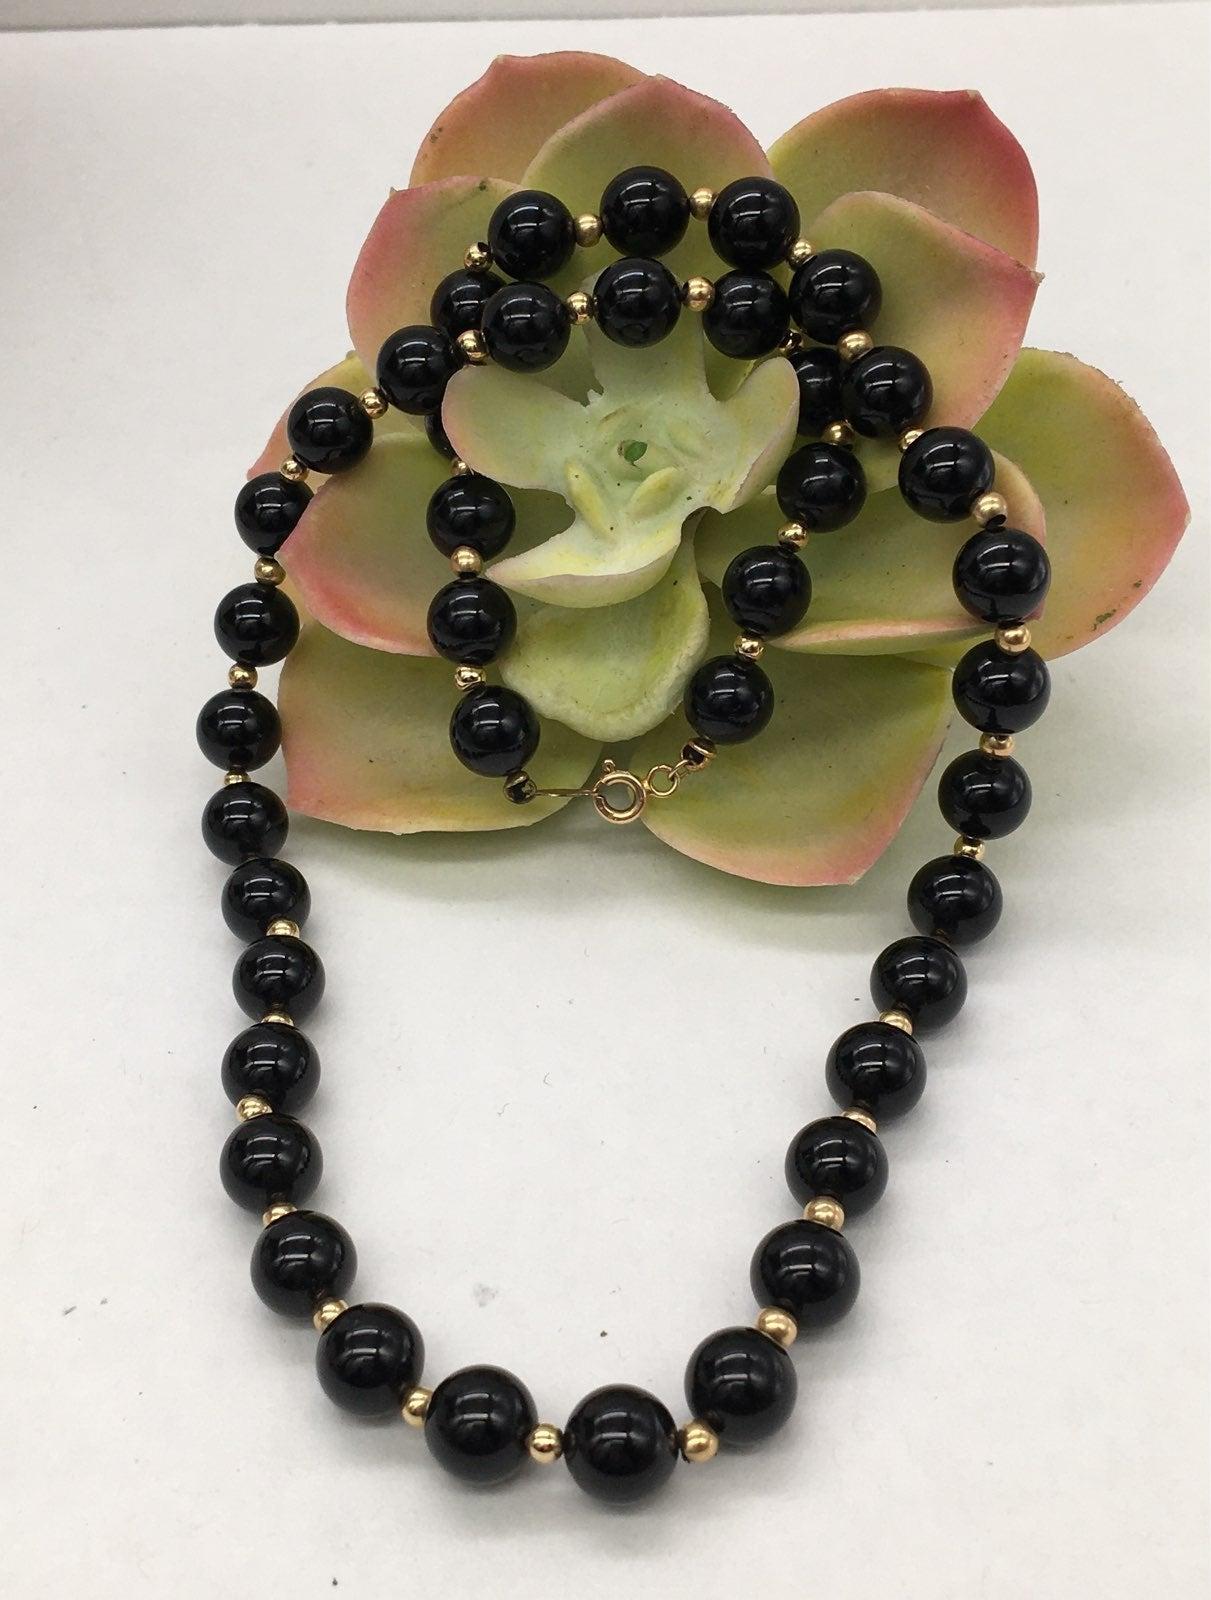 Vintage 14k gold black onyx necklace